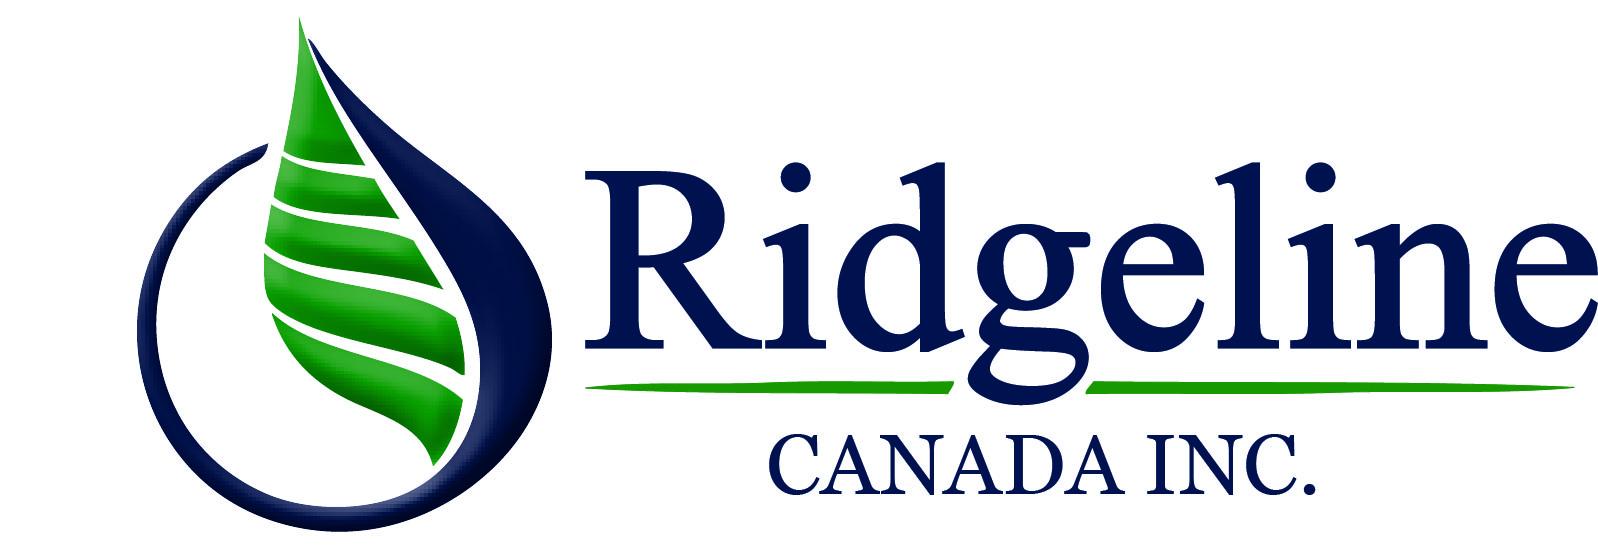 Ridgeline Canada